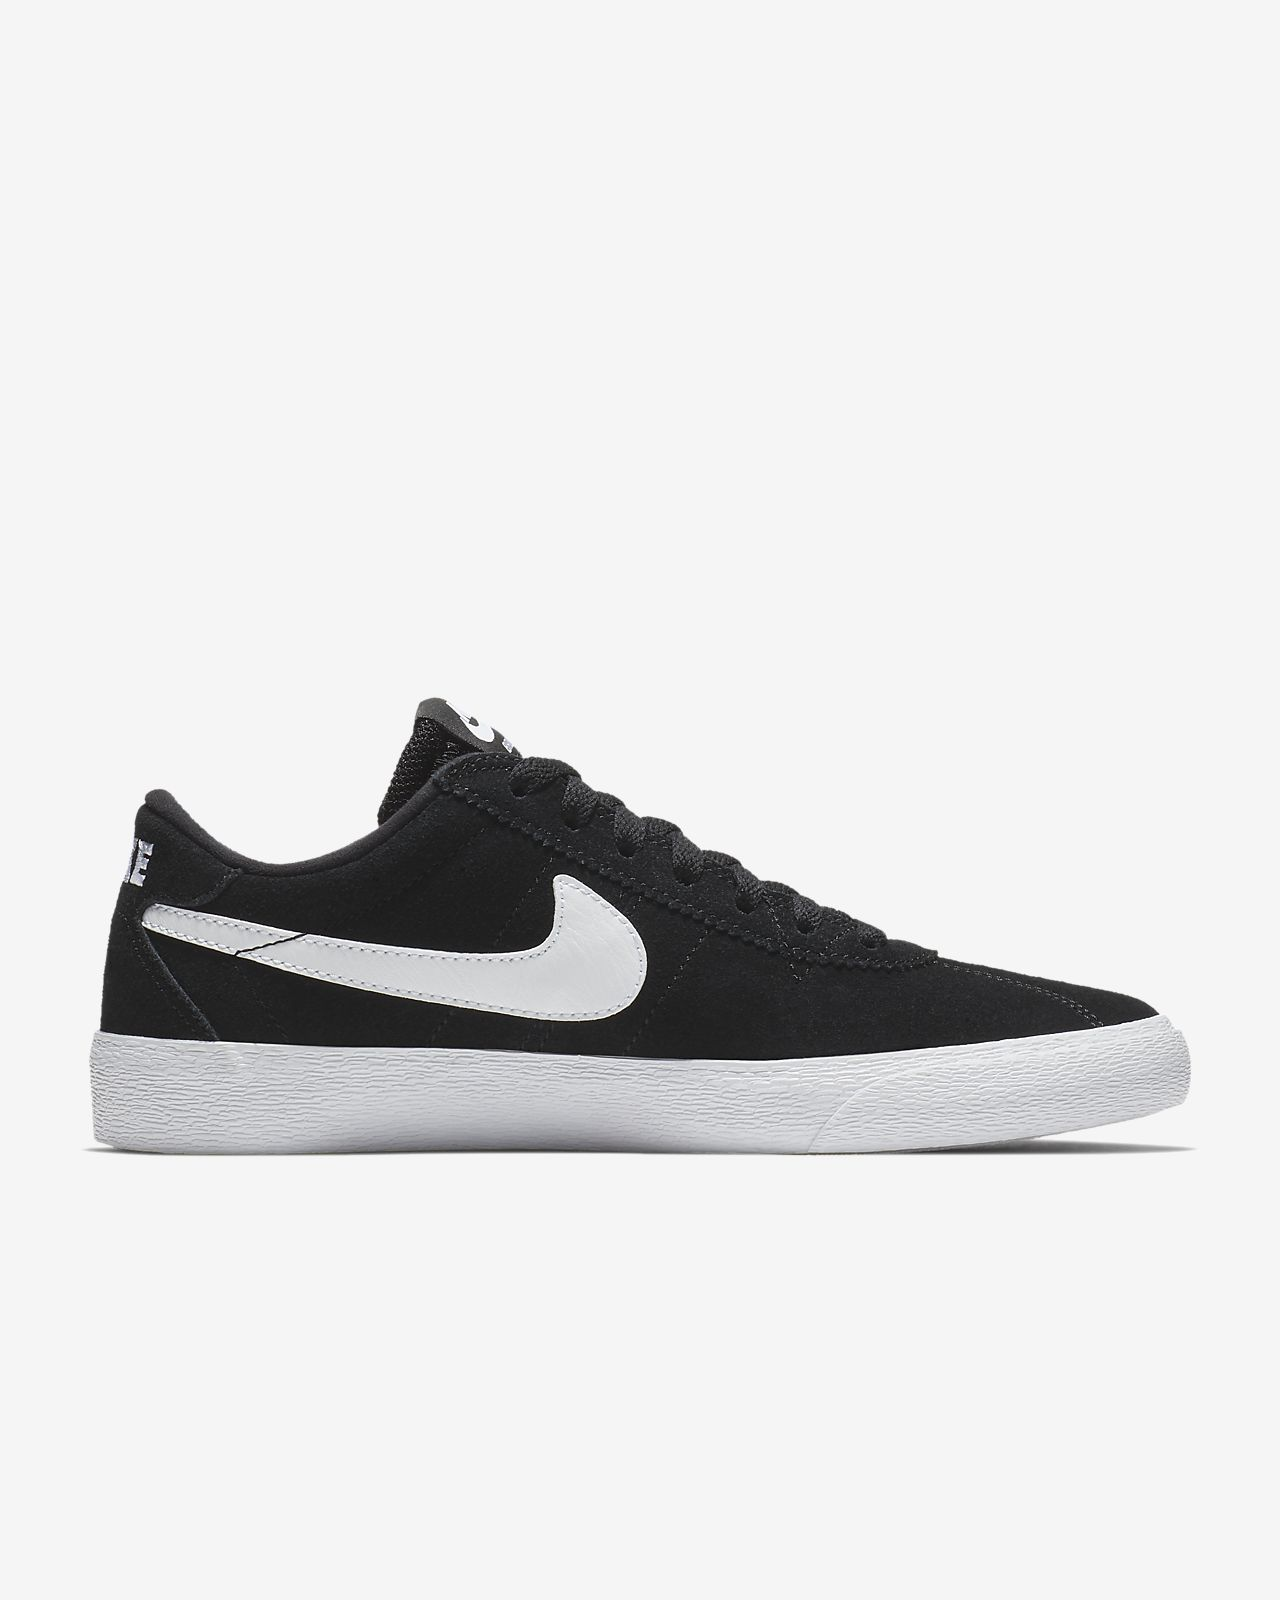 Low Femme De Sb Nike Chaussure Zoom Bruin Skateboard Pour 2Ye9EWHIbD